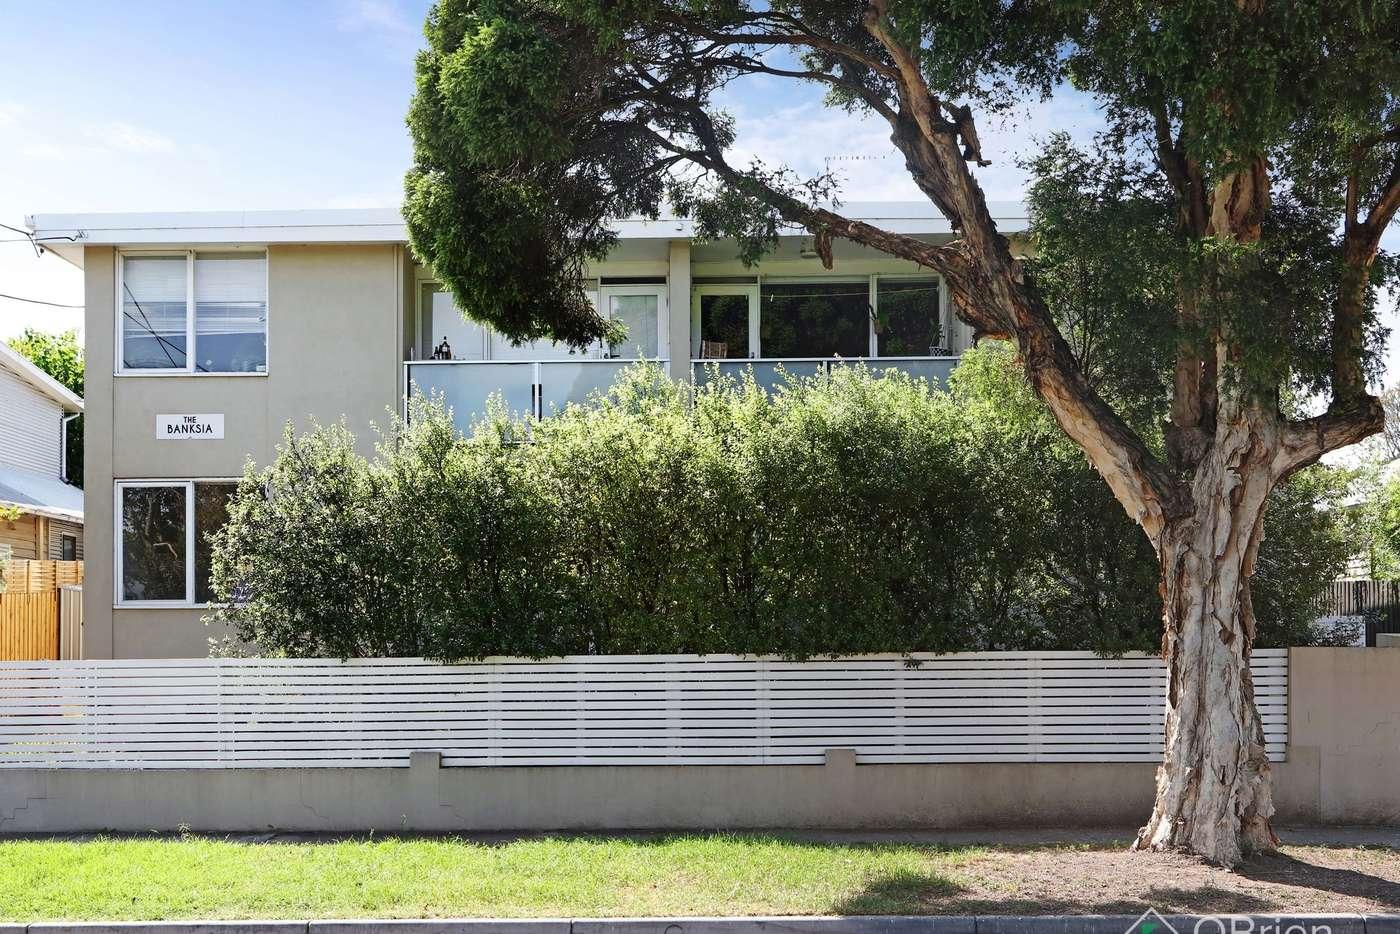 Main view of Homely apartment listing, 7/53 Kellett Street, Northcote VIC 3070